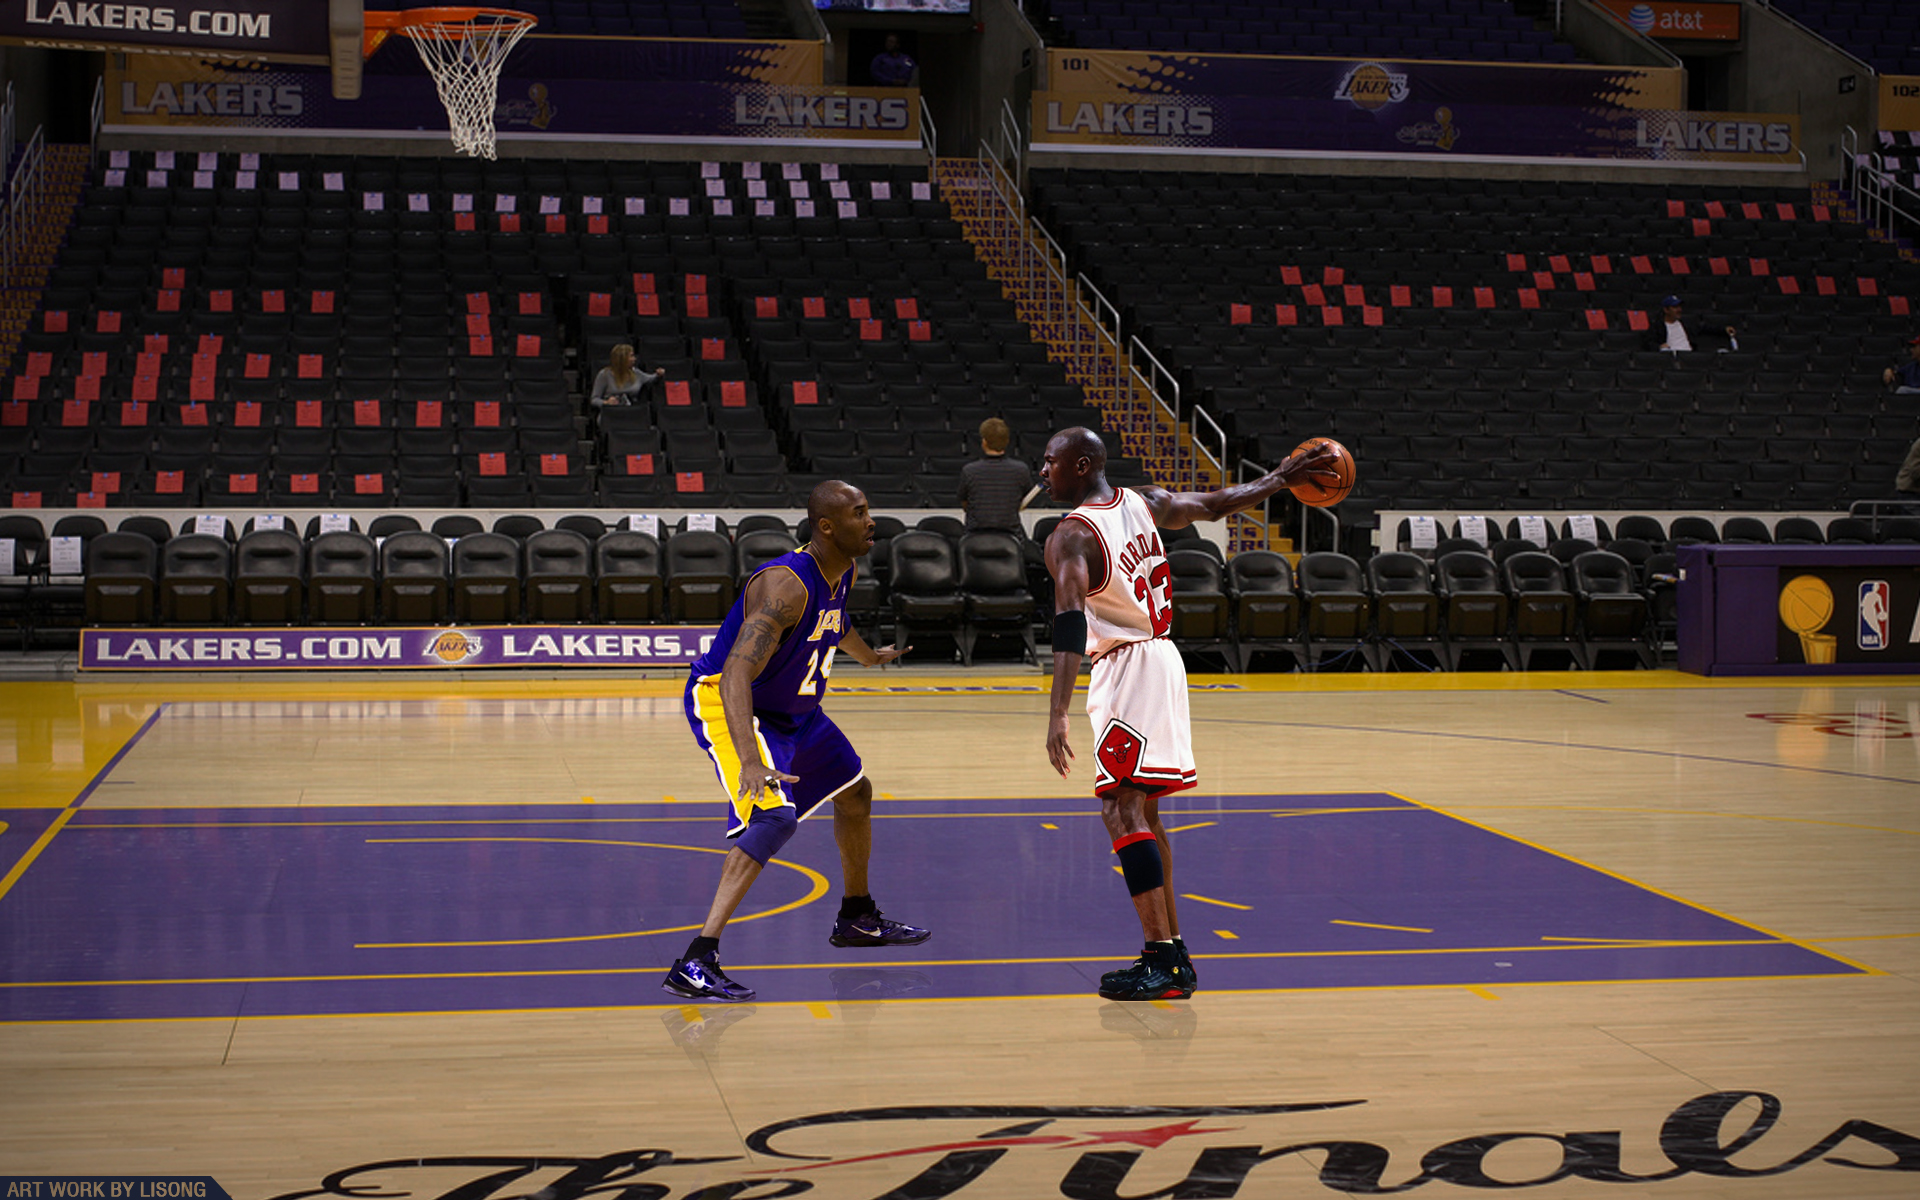 201205081kobe Bryant Vs Michael Jordan By Lisong24kobe D4q81cbjpg 1920x1200